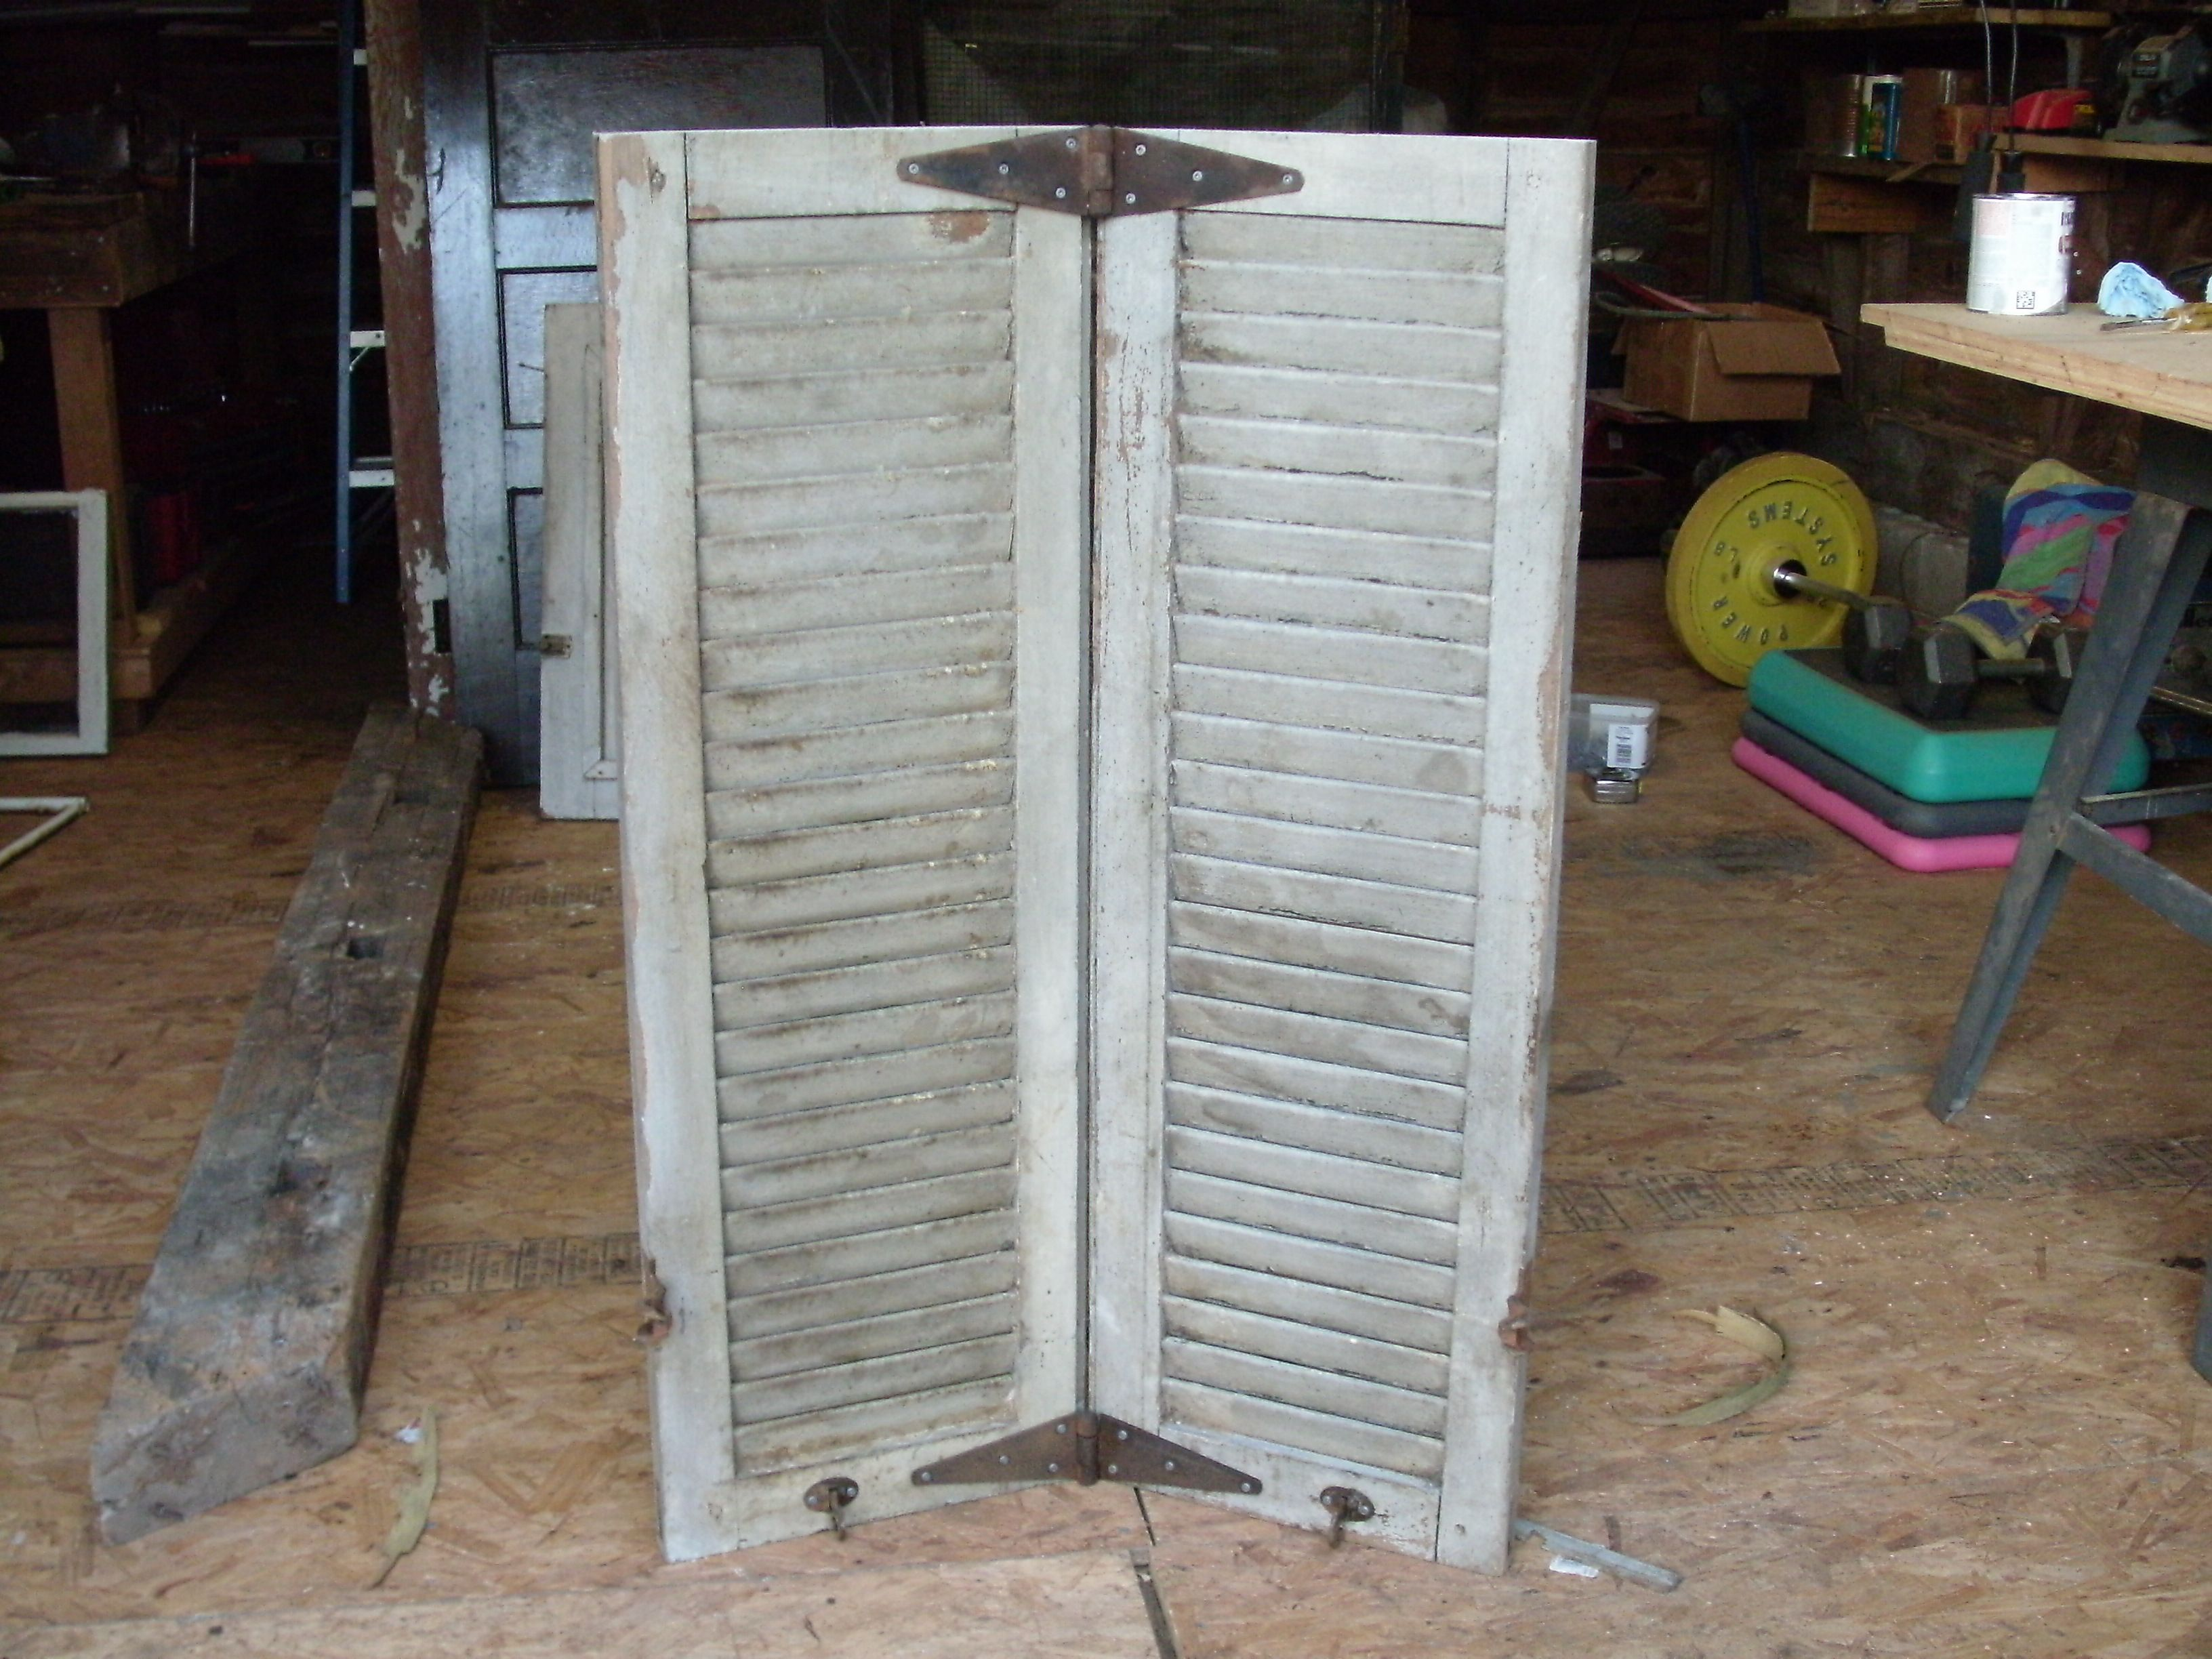 kits barn inc org calculator plans door cost shed endtextwrecks diy hinges barns